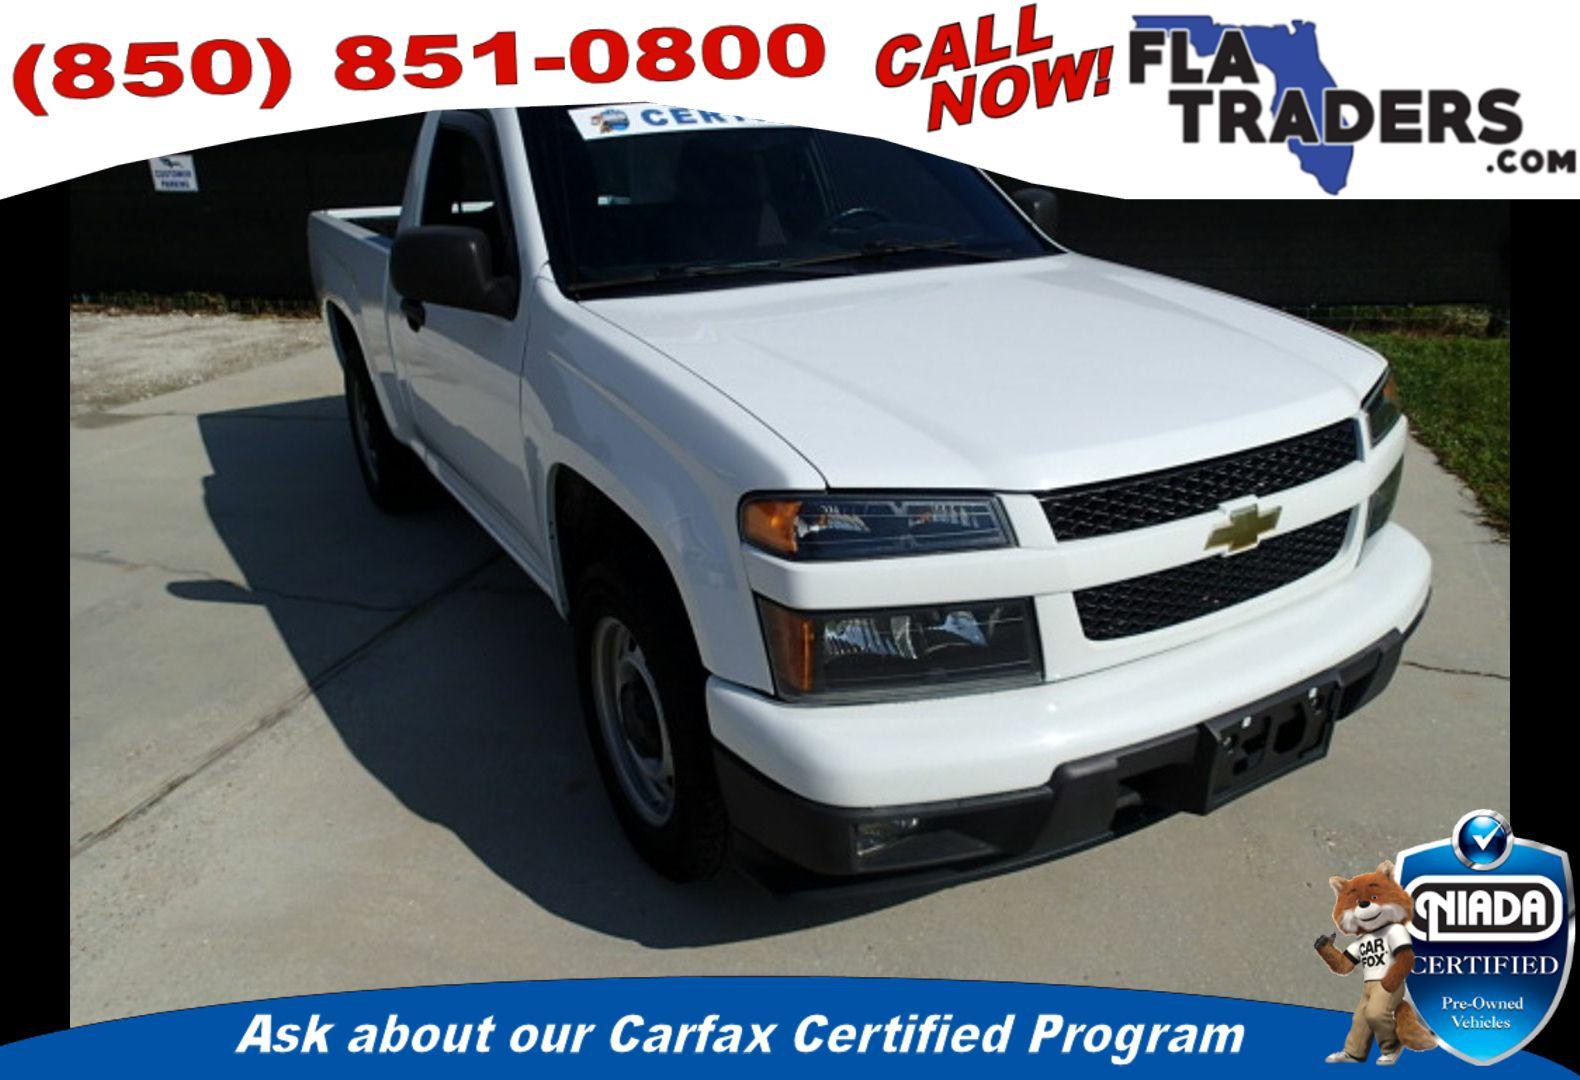 2011 SCION XB - Florida Traders Used Cars in Panama City FL ...